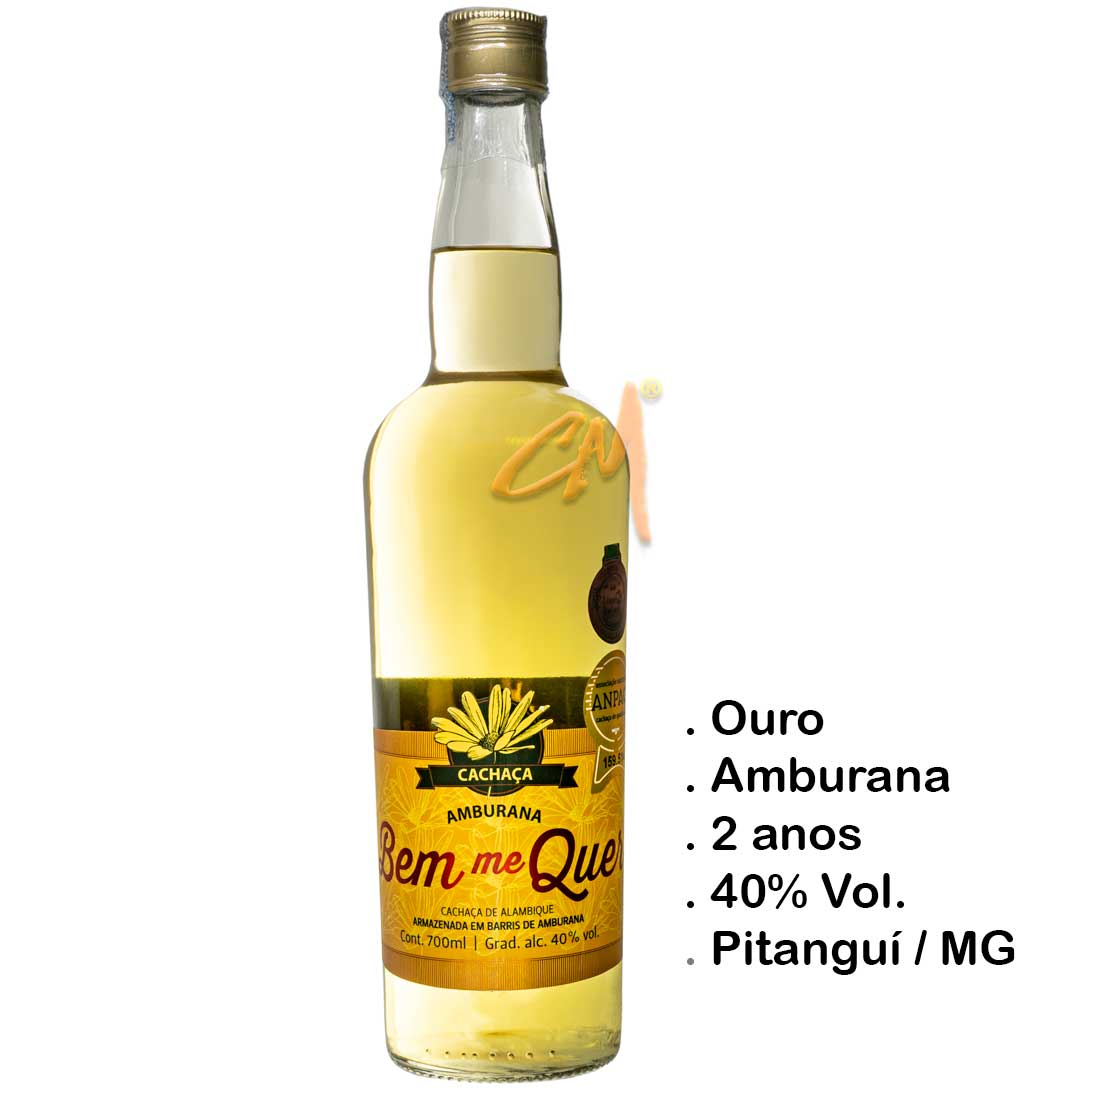 Cachaça Bem Me Quer Amburana 700 ml (Pitanguí - MG)